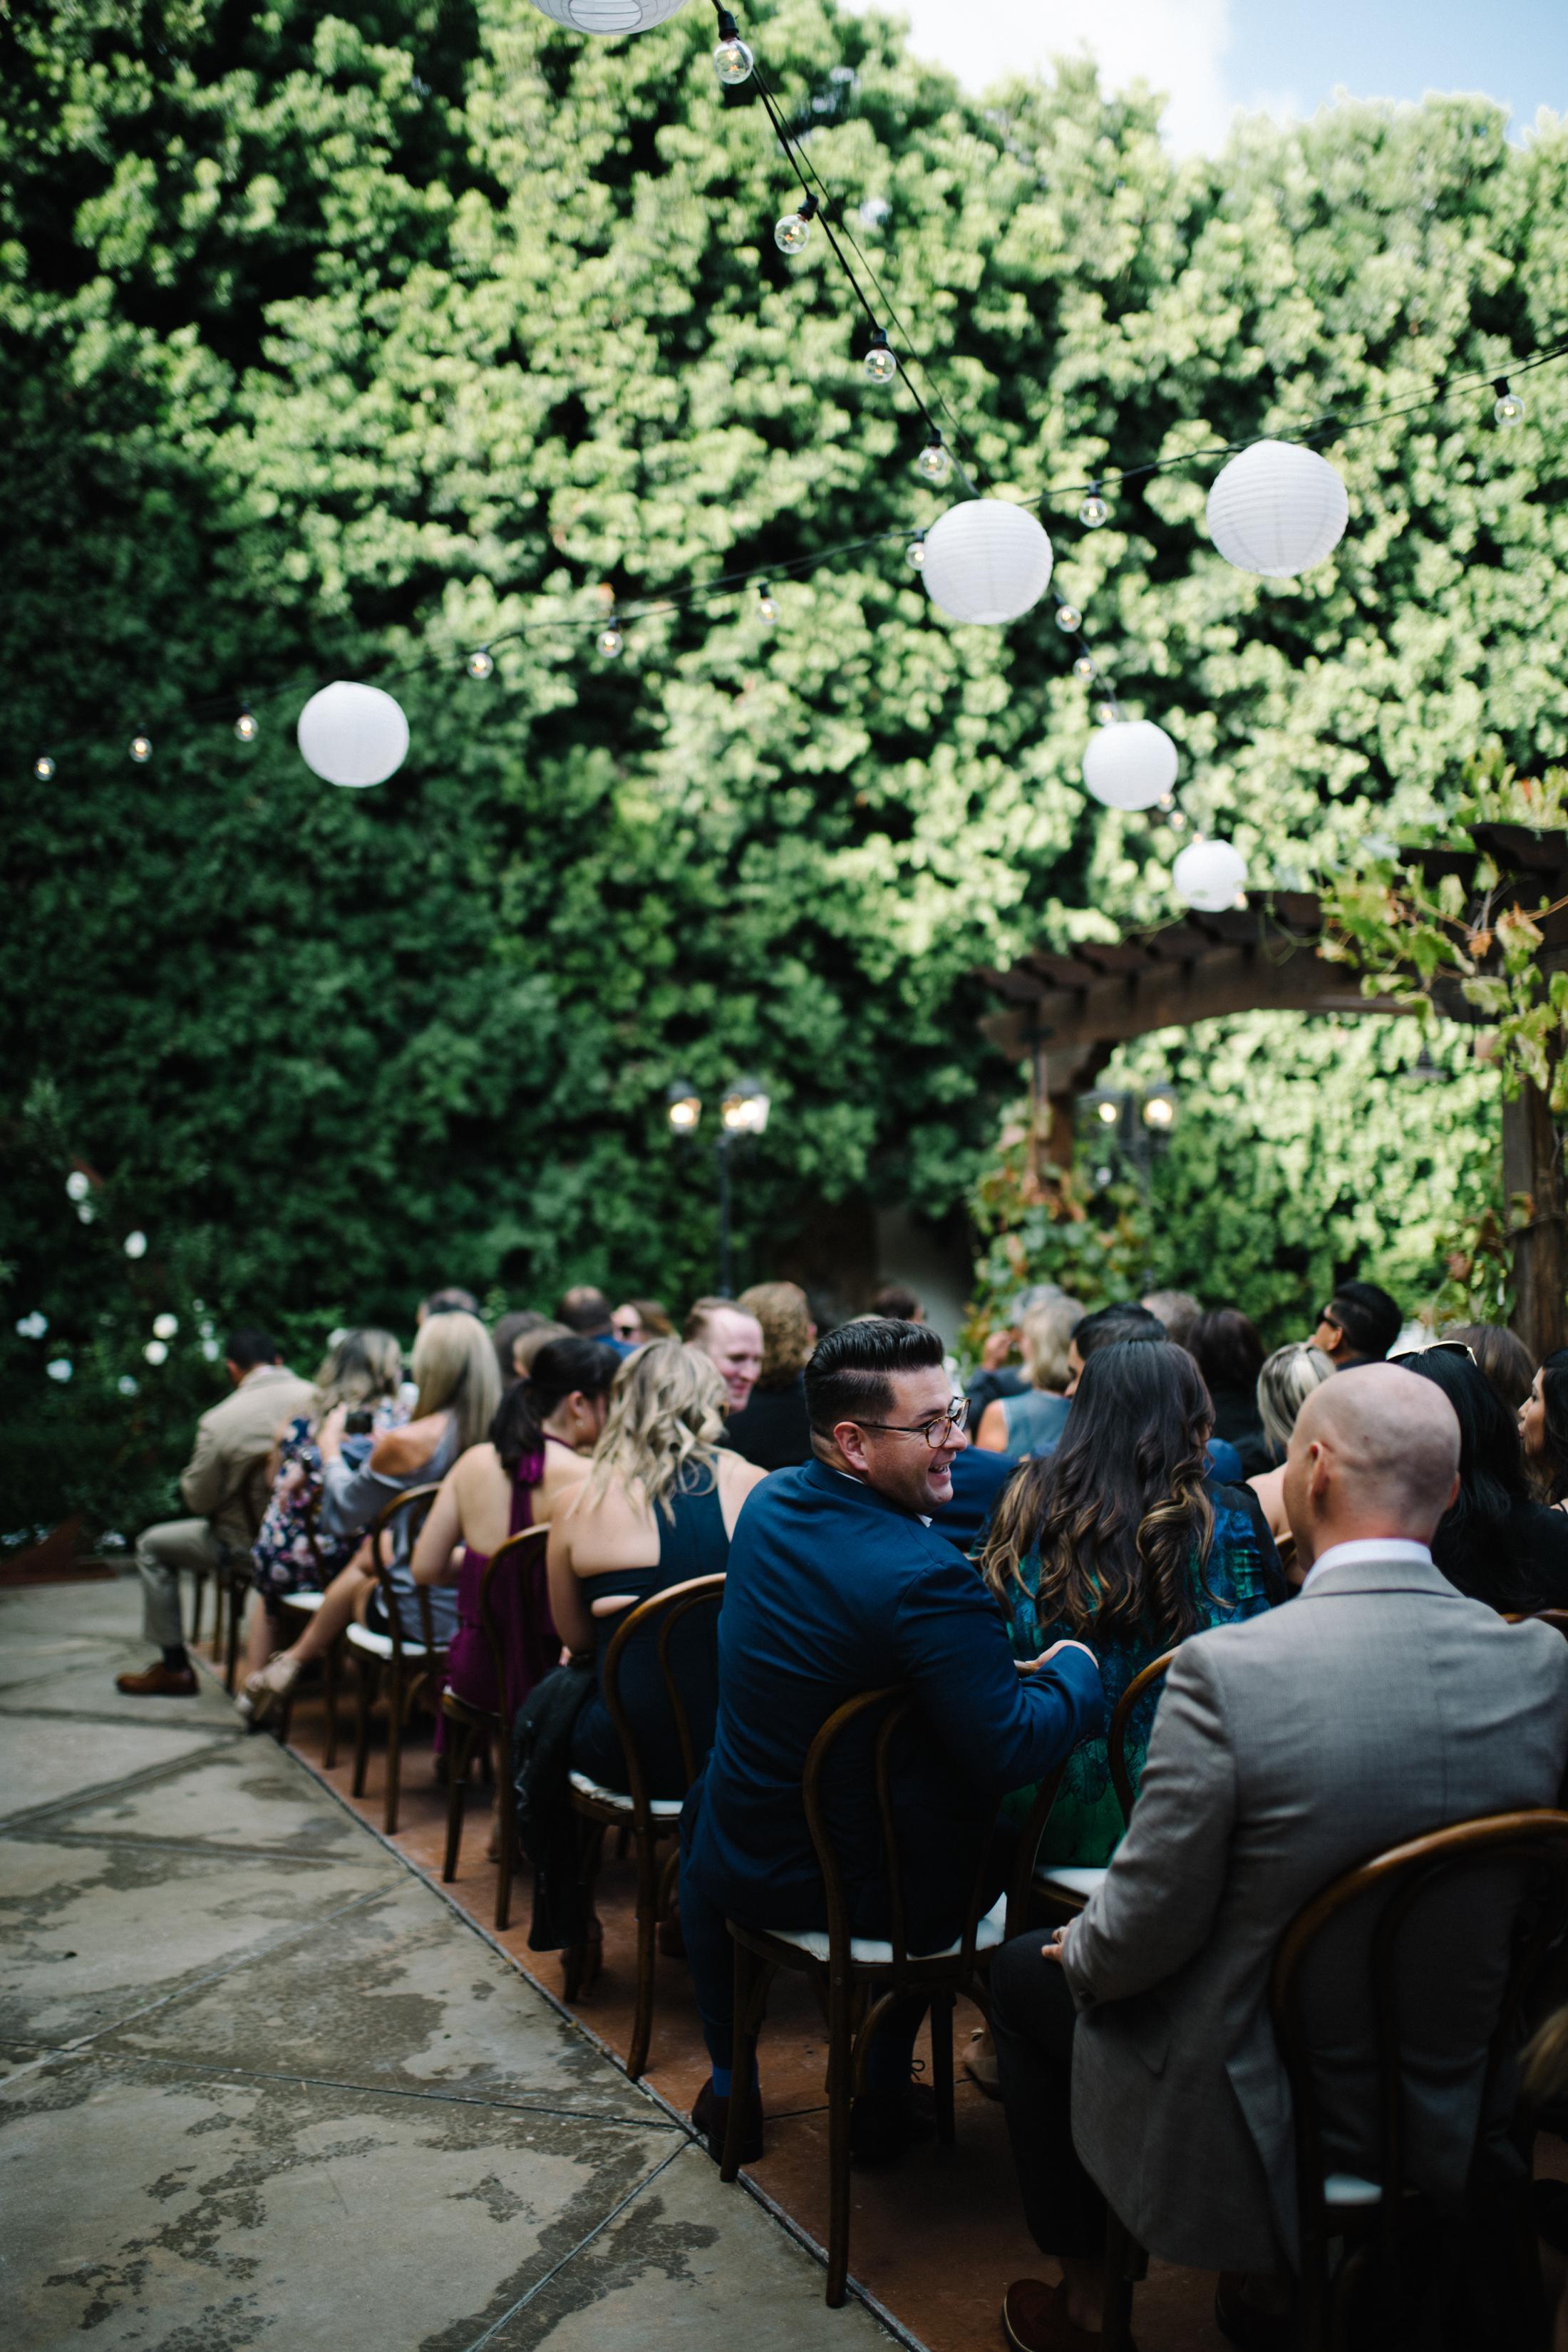 franciscan_garden_wedding-36.jpg